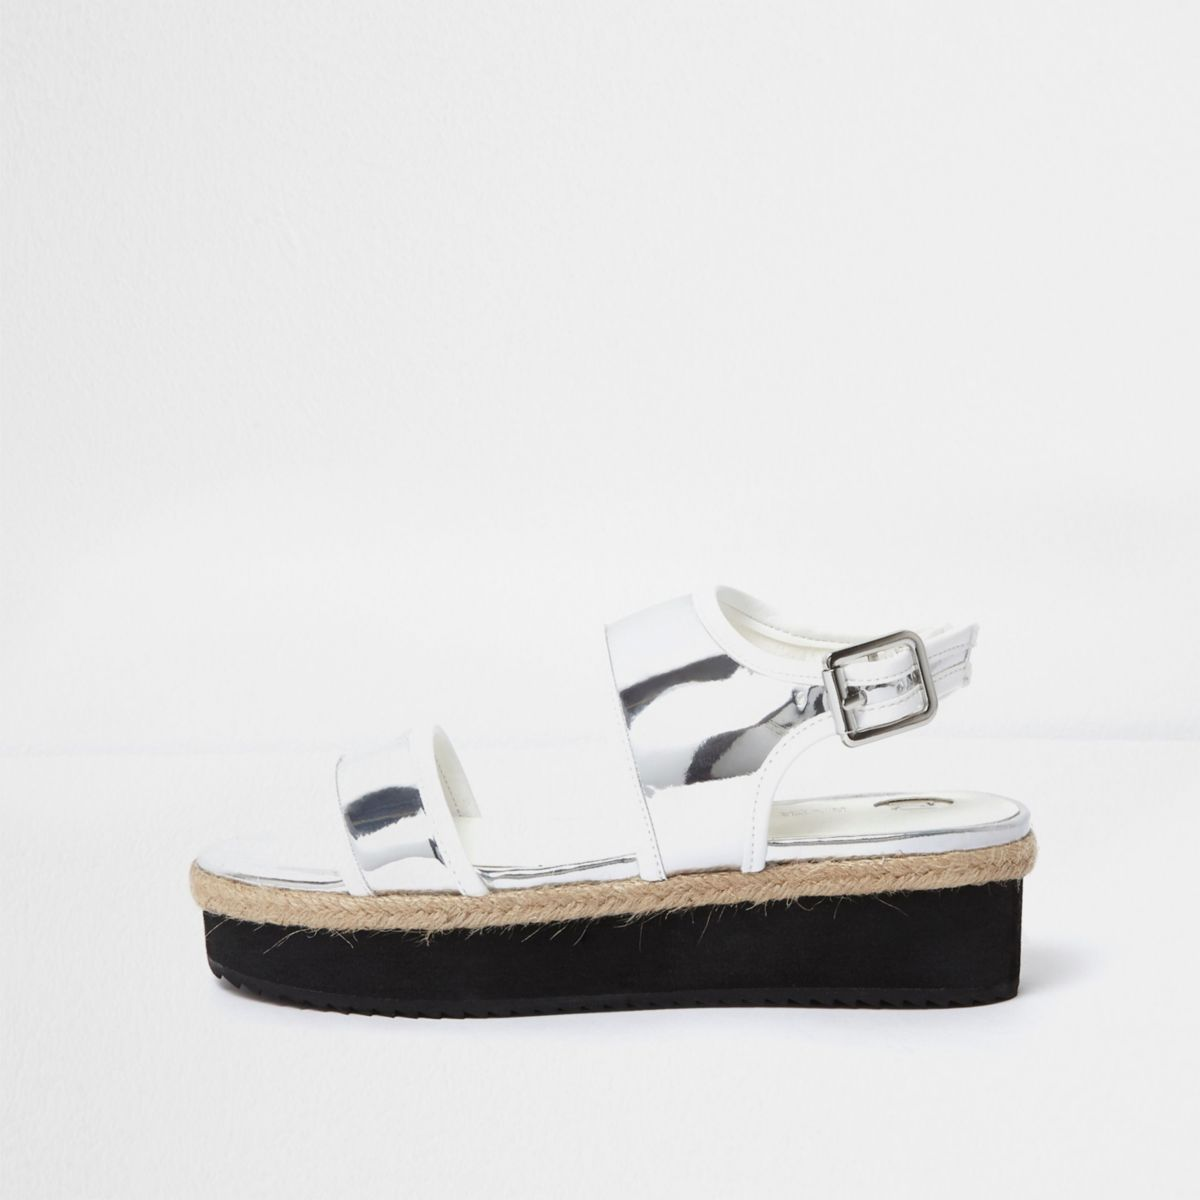 Girls metallic silver flatform sandals